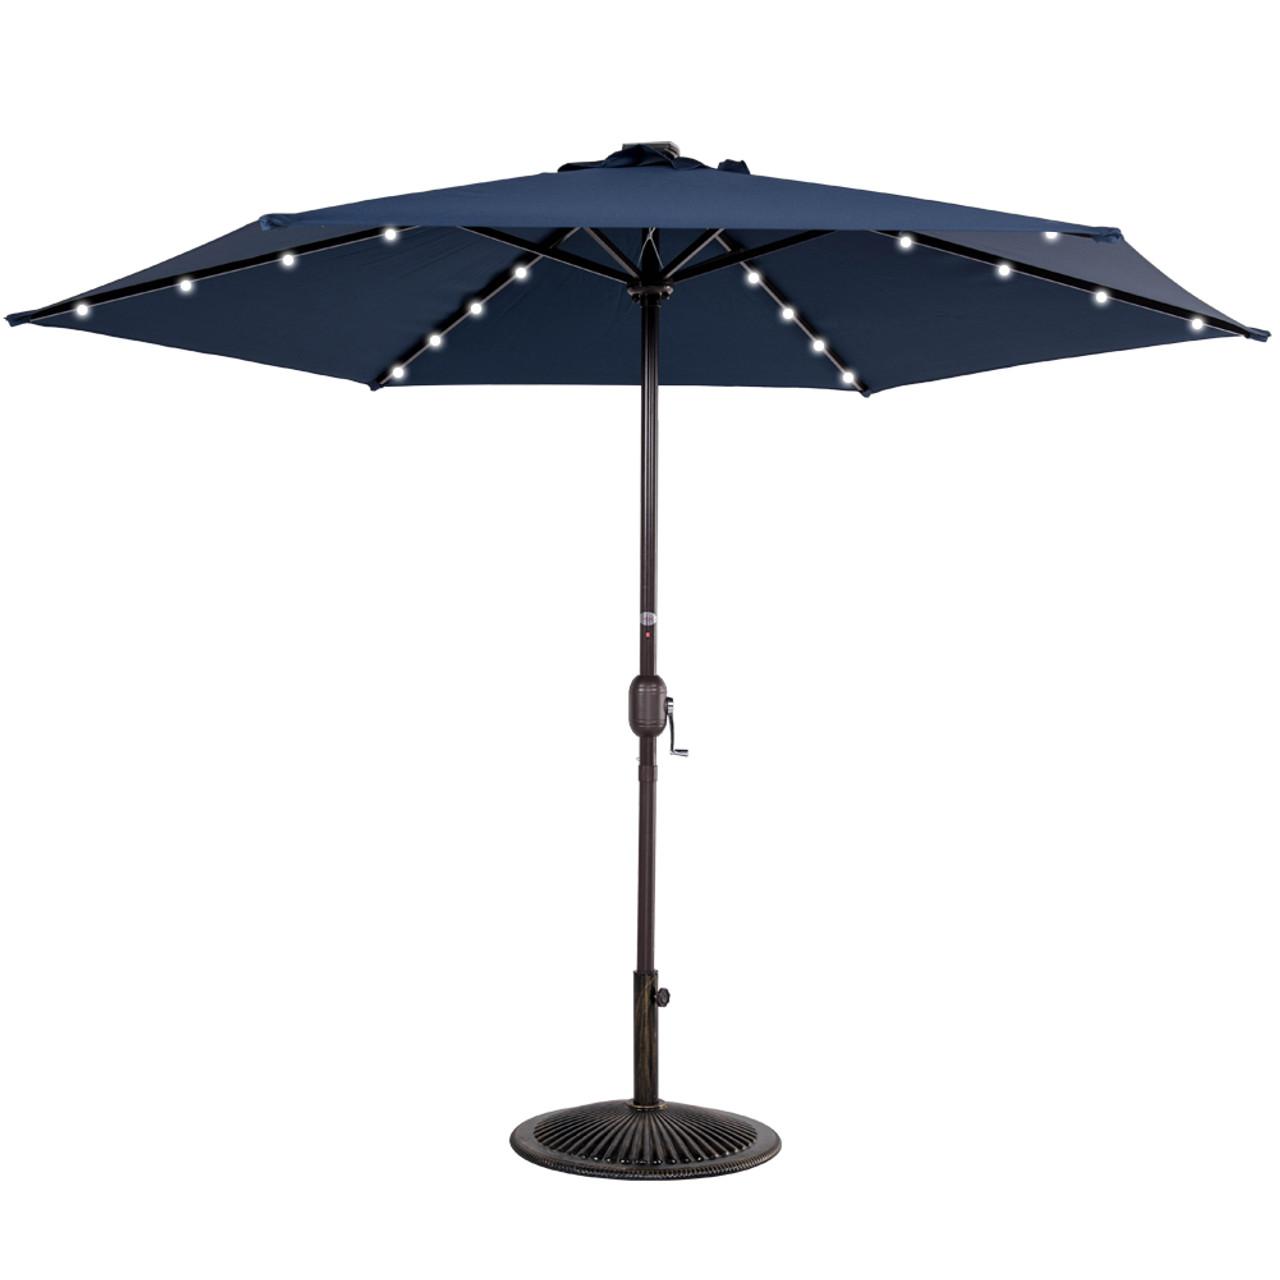 9ft 24 Led Light Outdoor Market Patio Umbrella Garden Pool With Crank, 6  Ribs (Navy Blue)